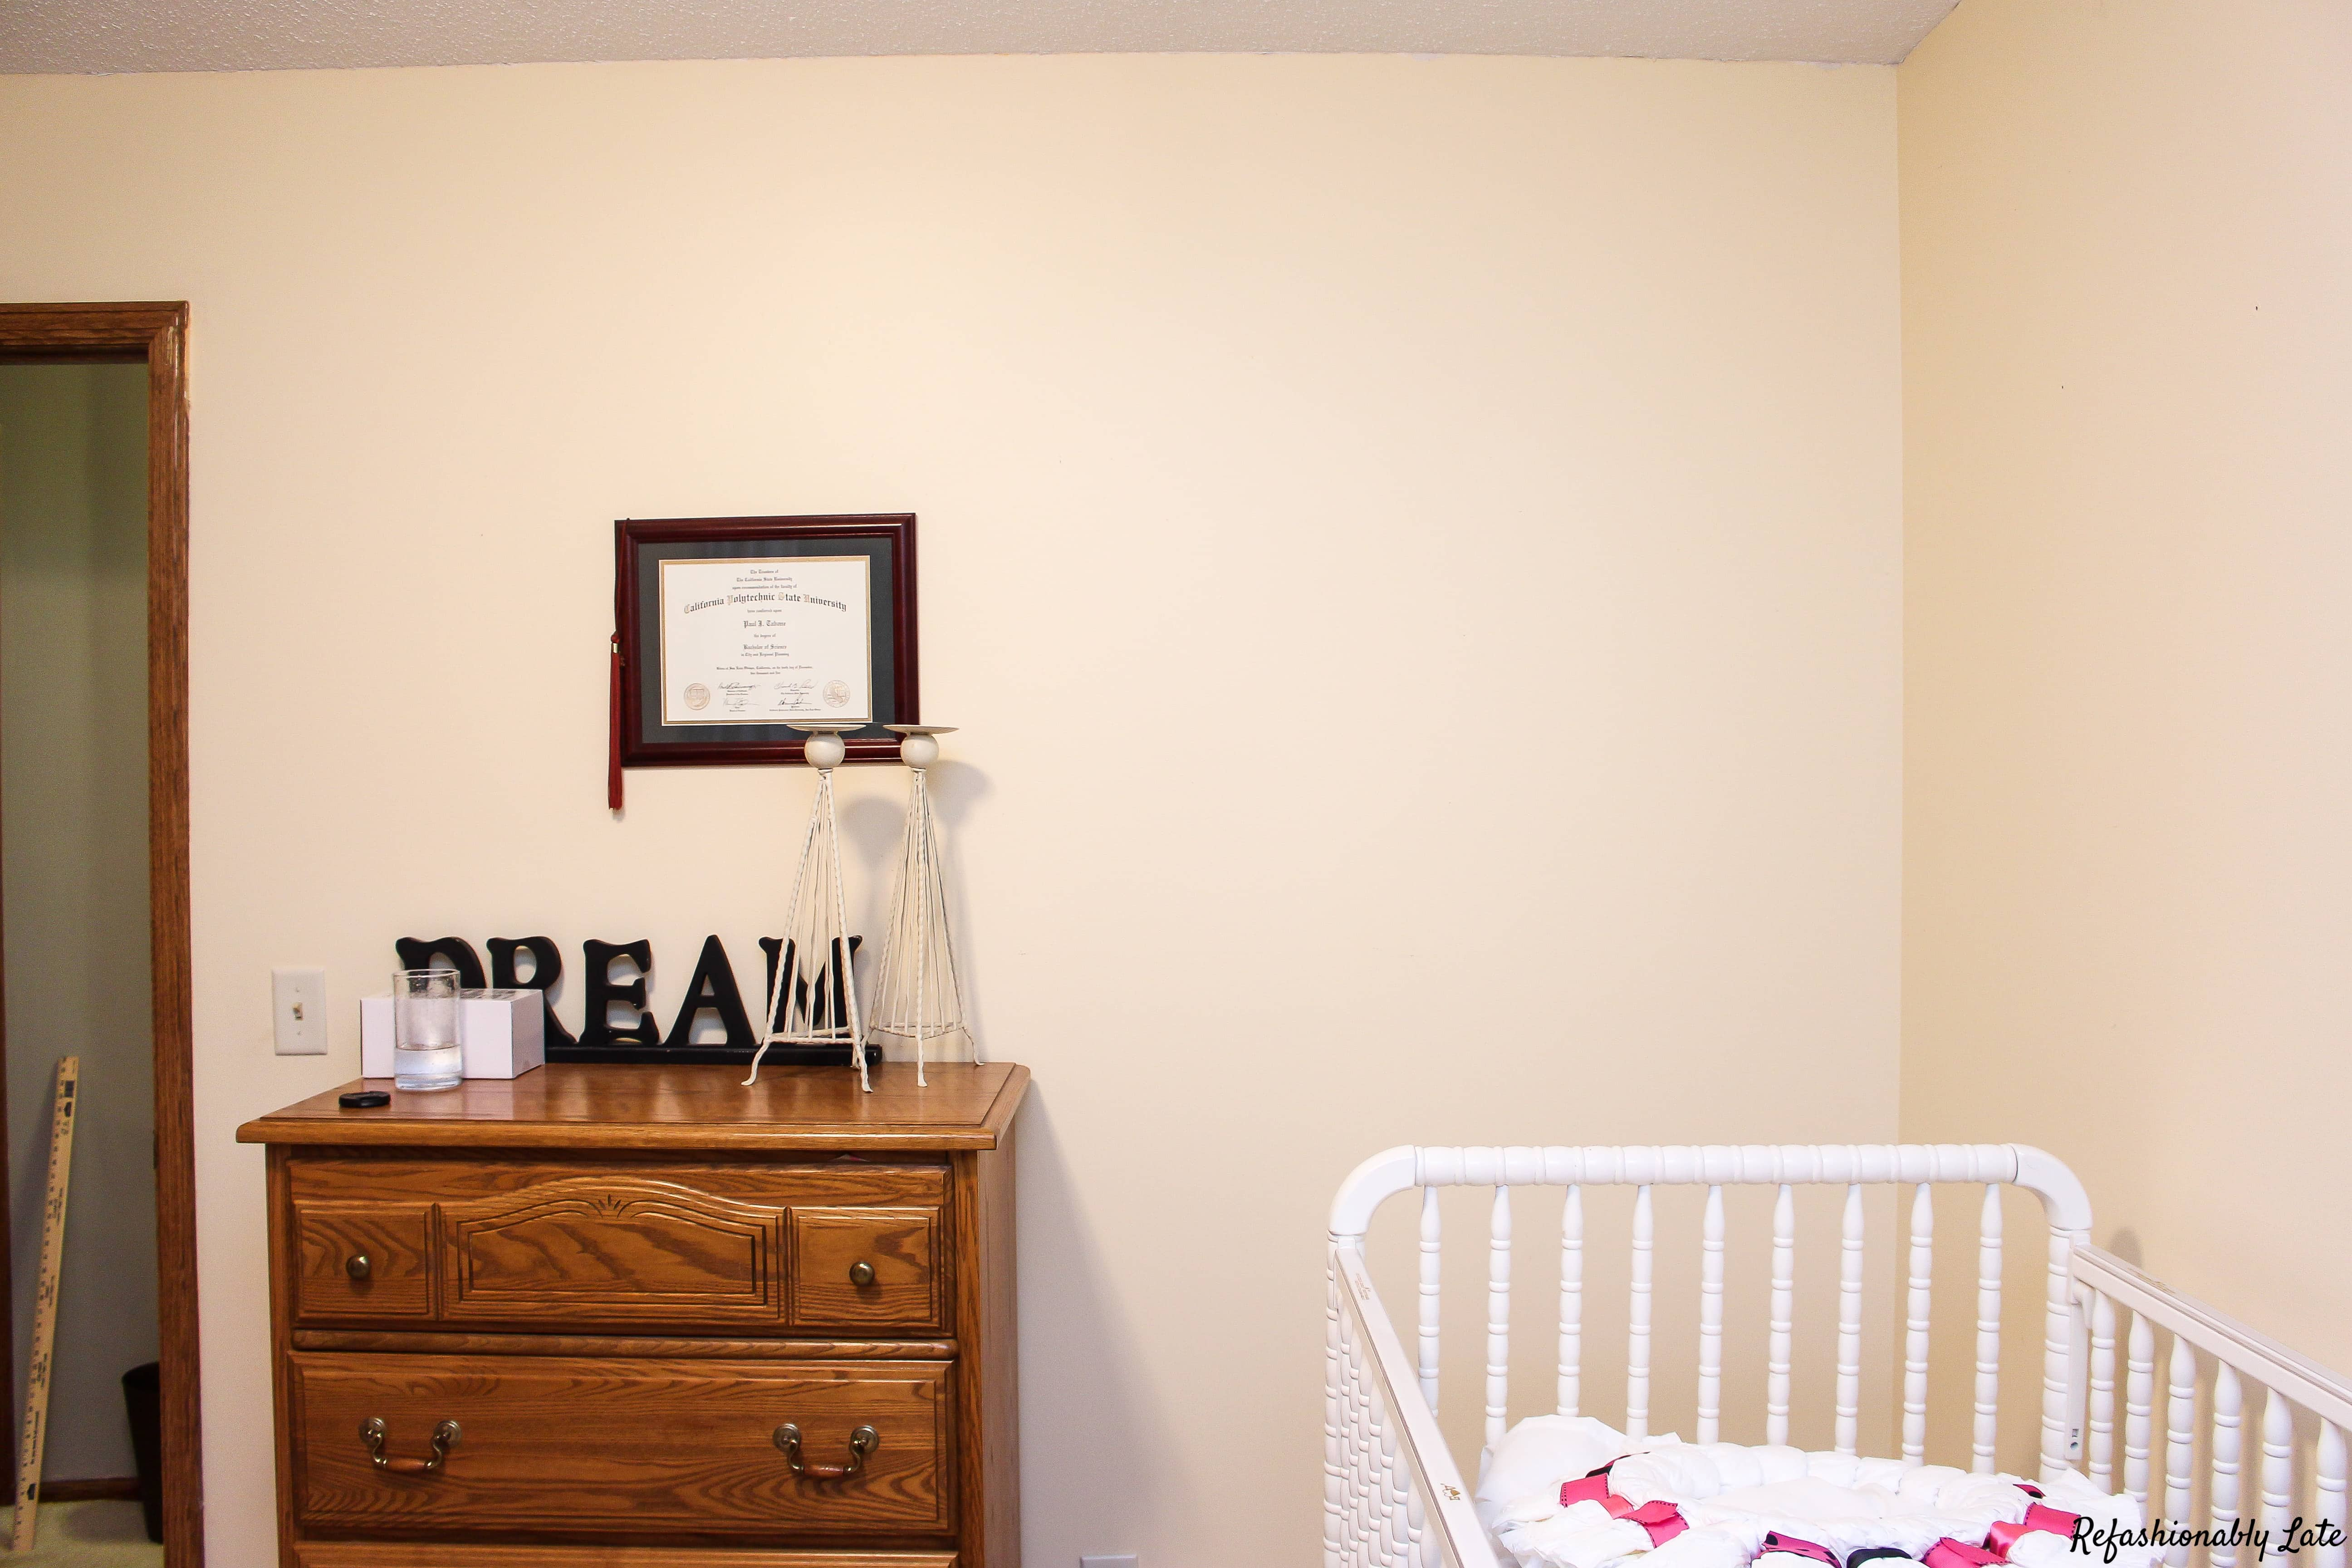 One Room Challenge Week 1 - Nursery - www.refashionablylate.com